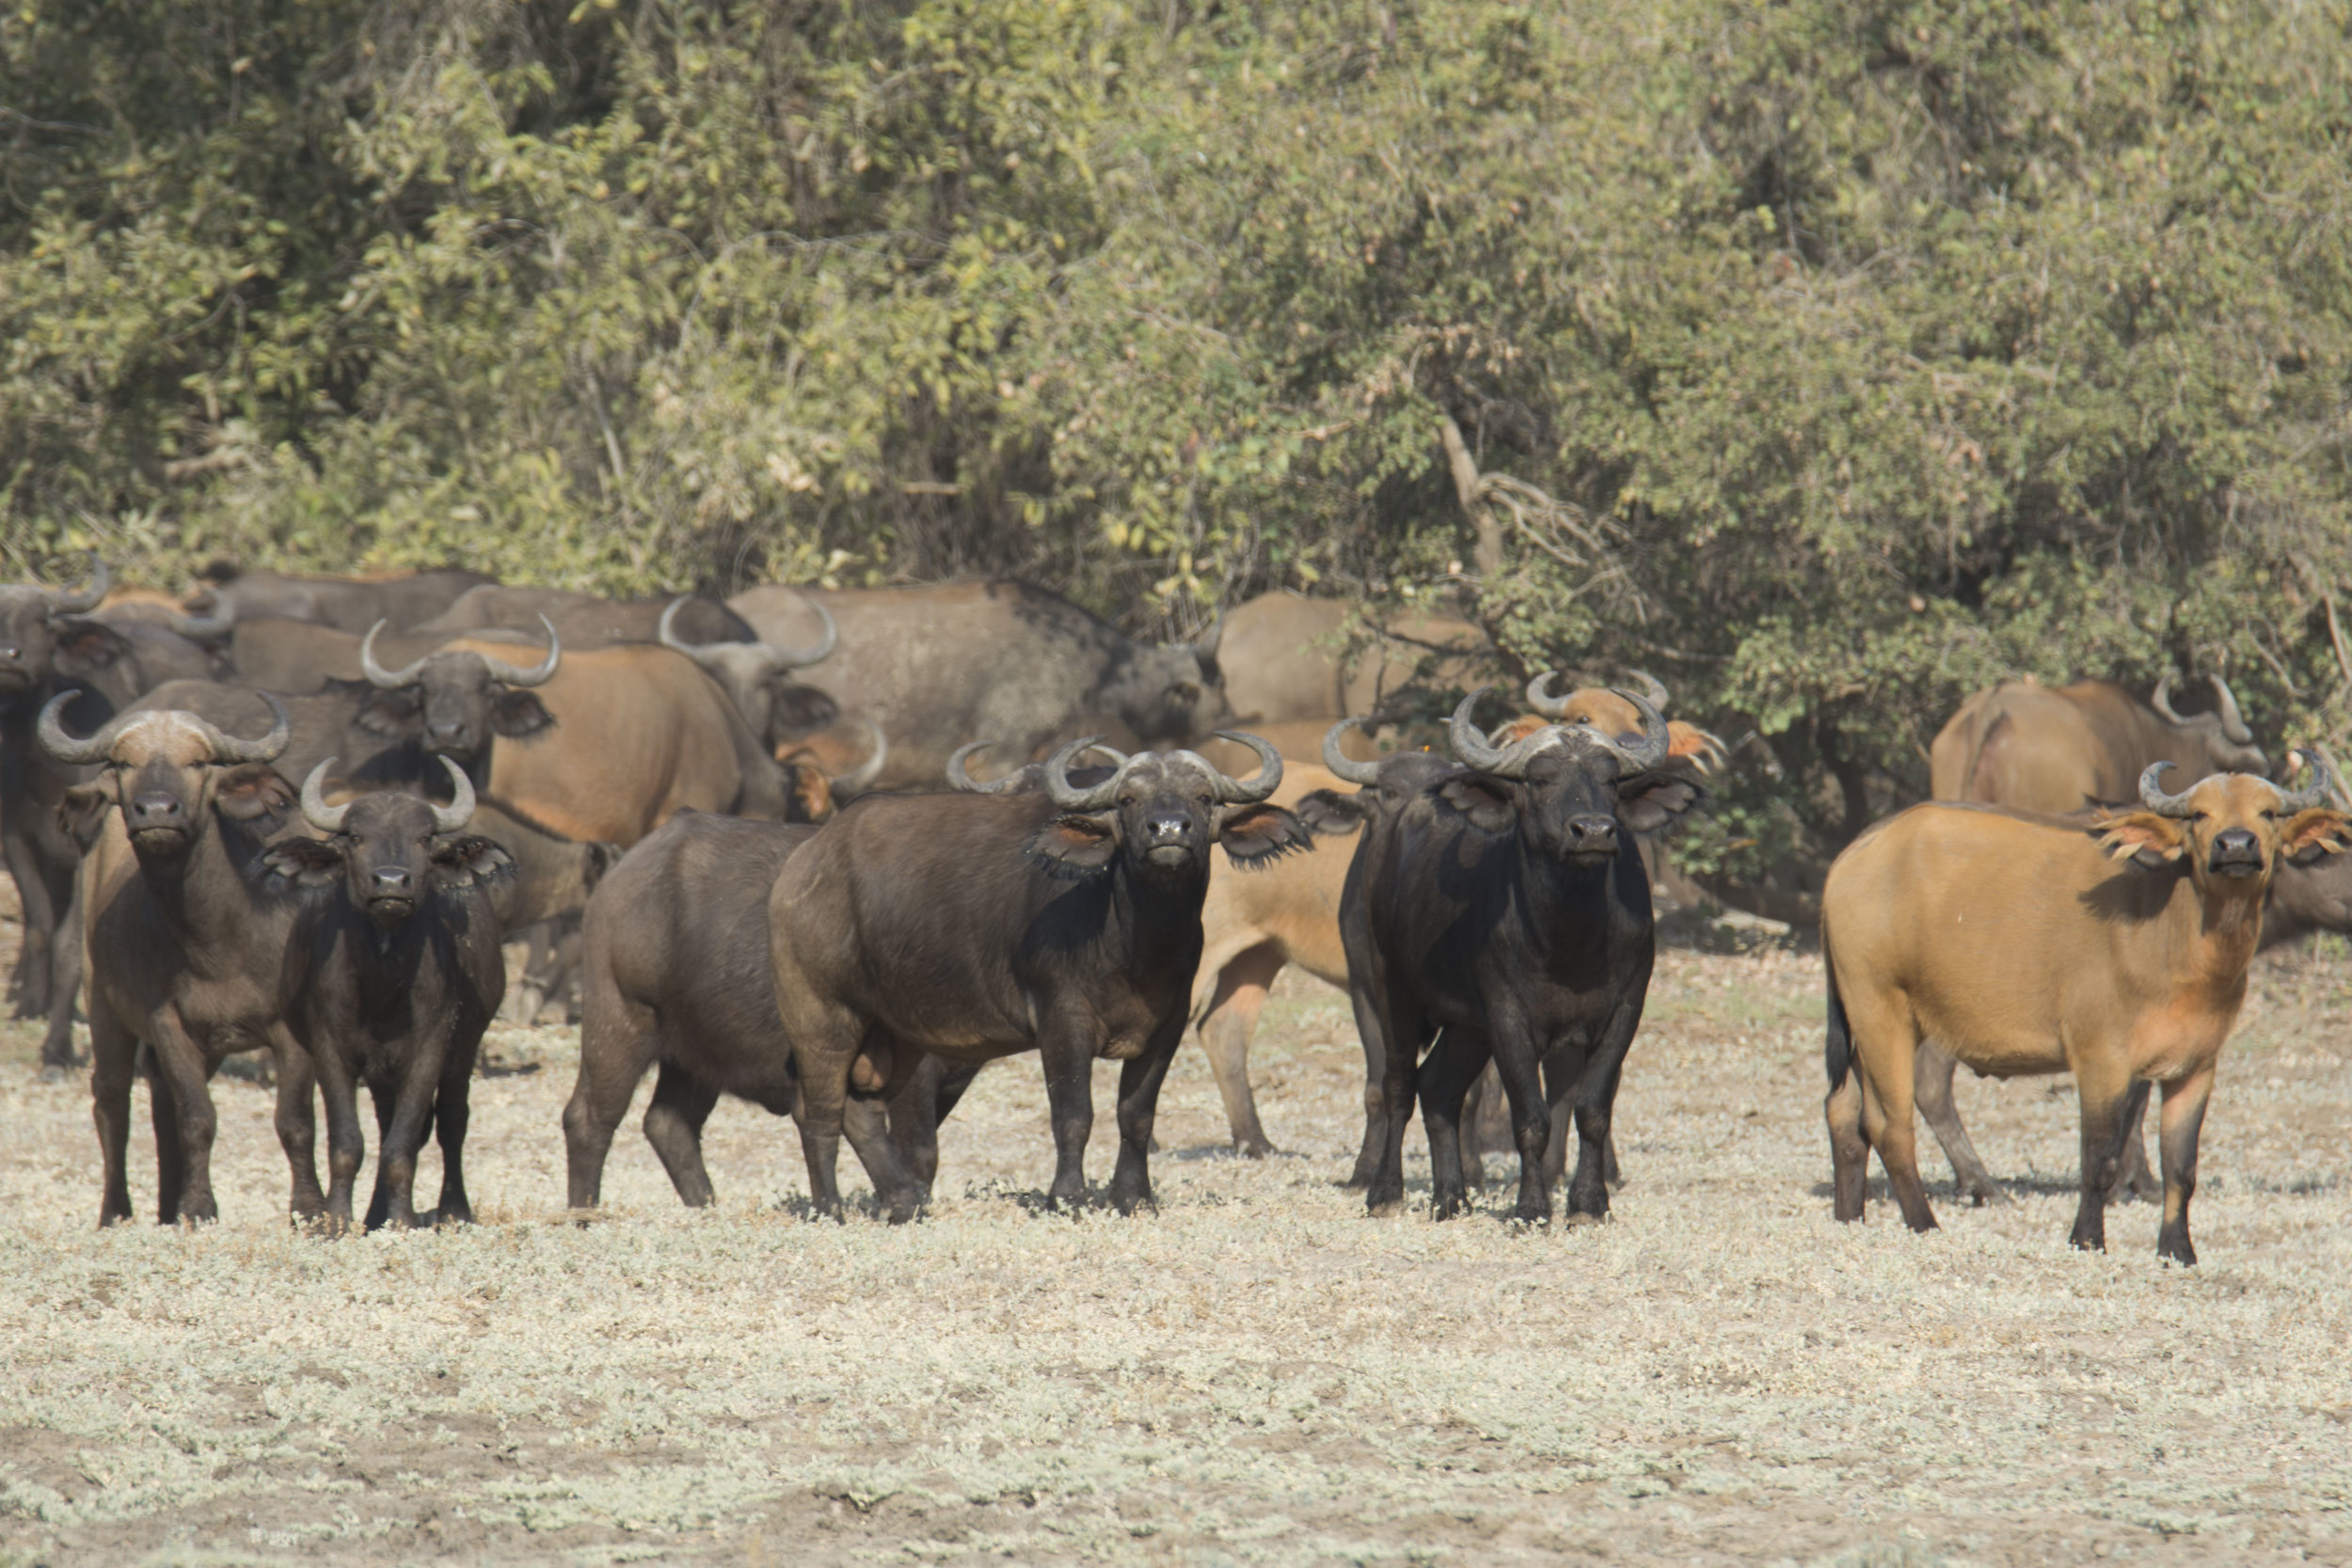 Buffalo,at Zakouma Park. Photography by Karoline Hood.